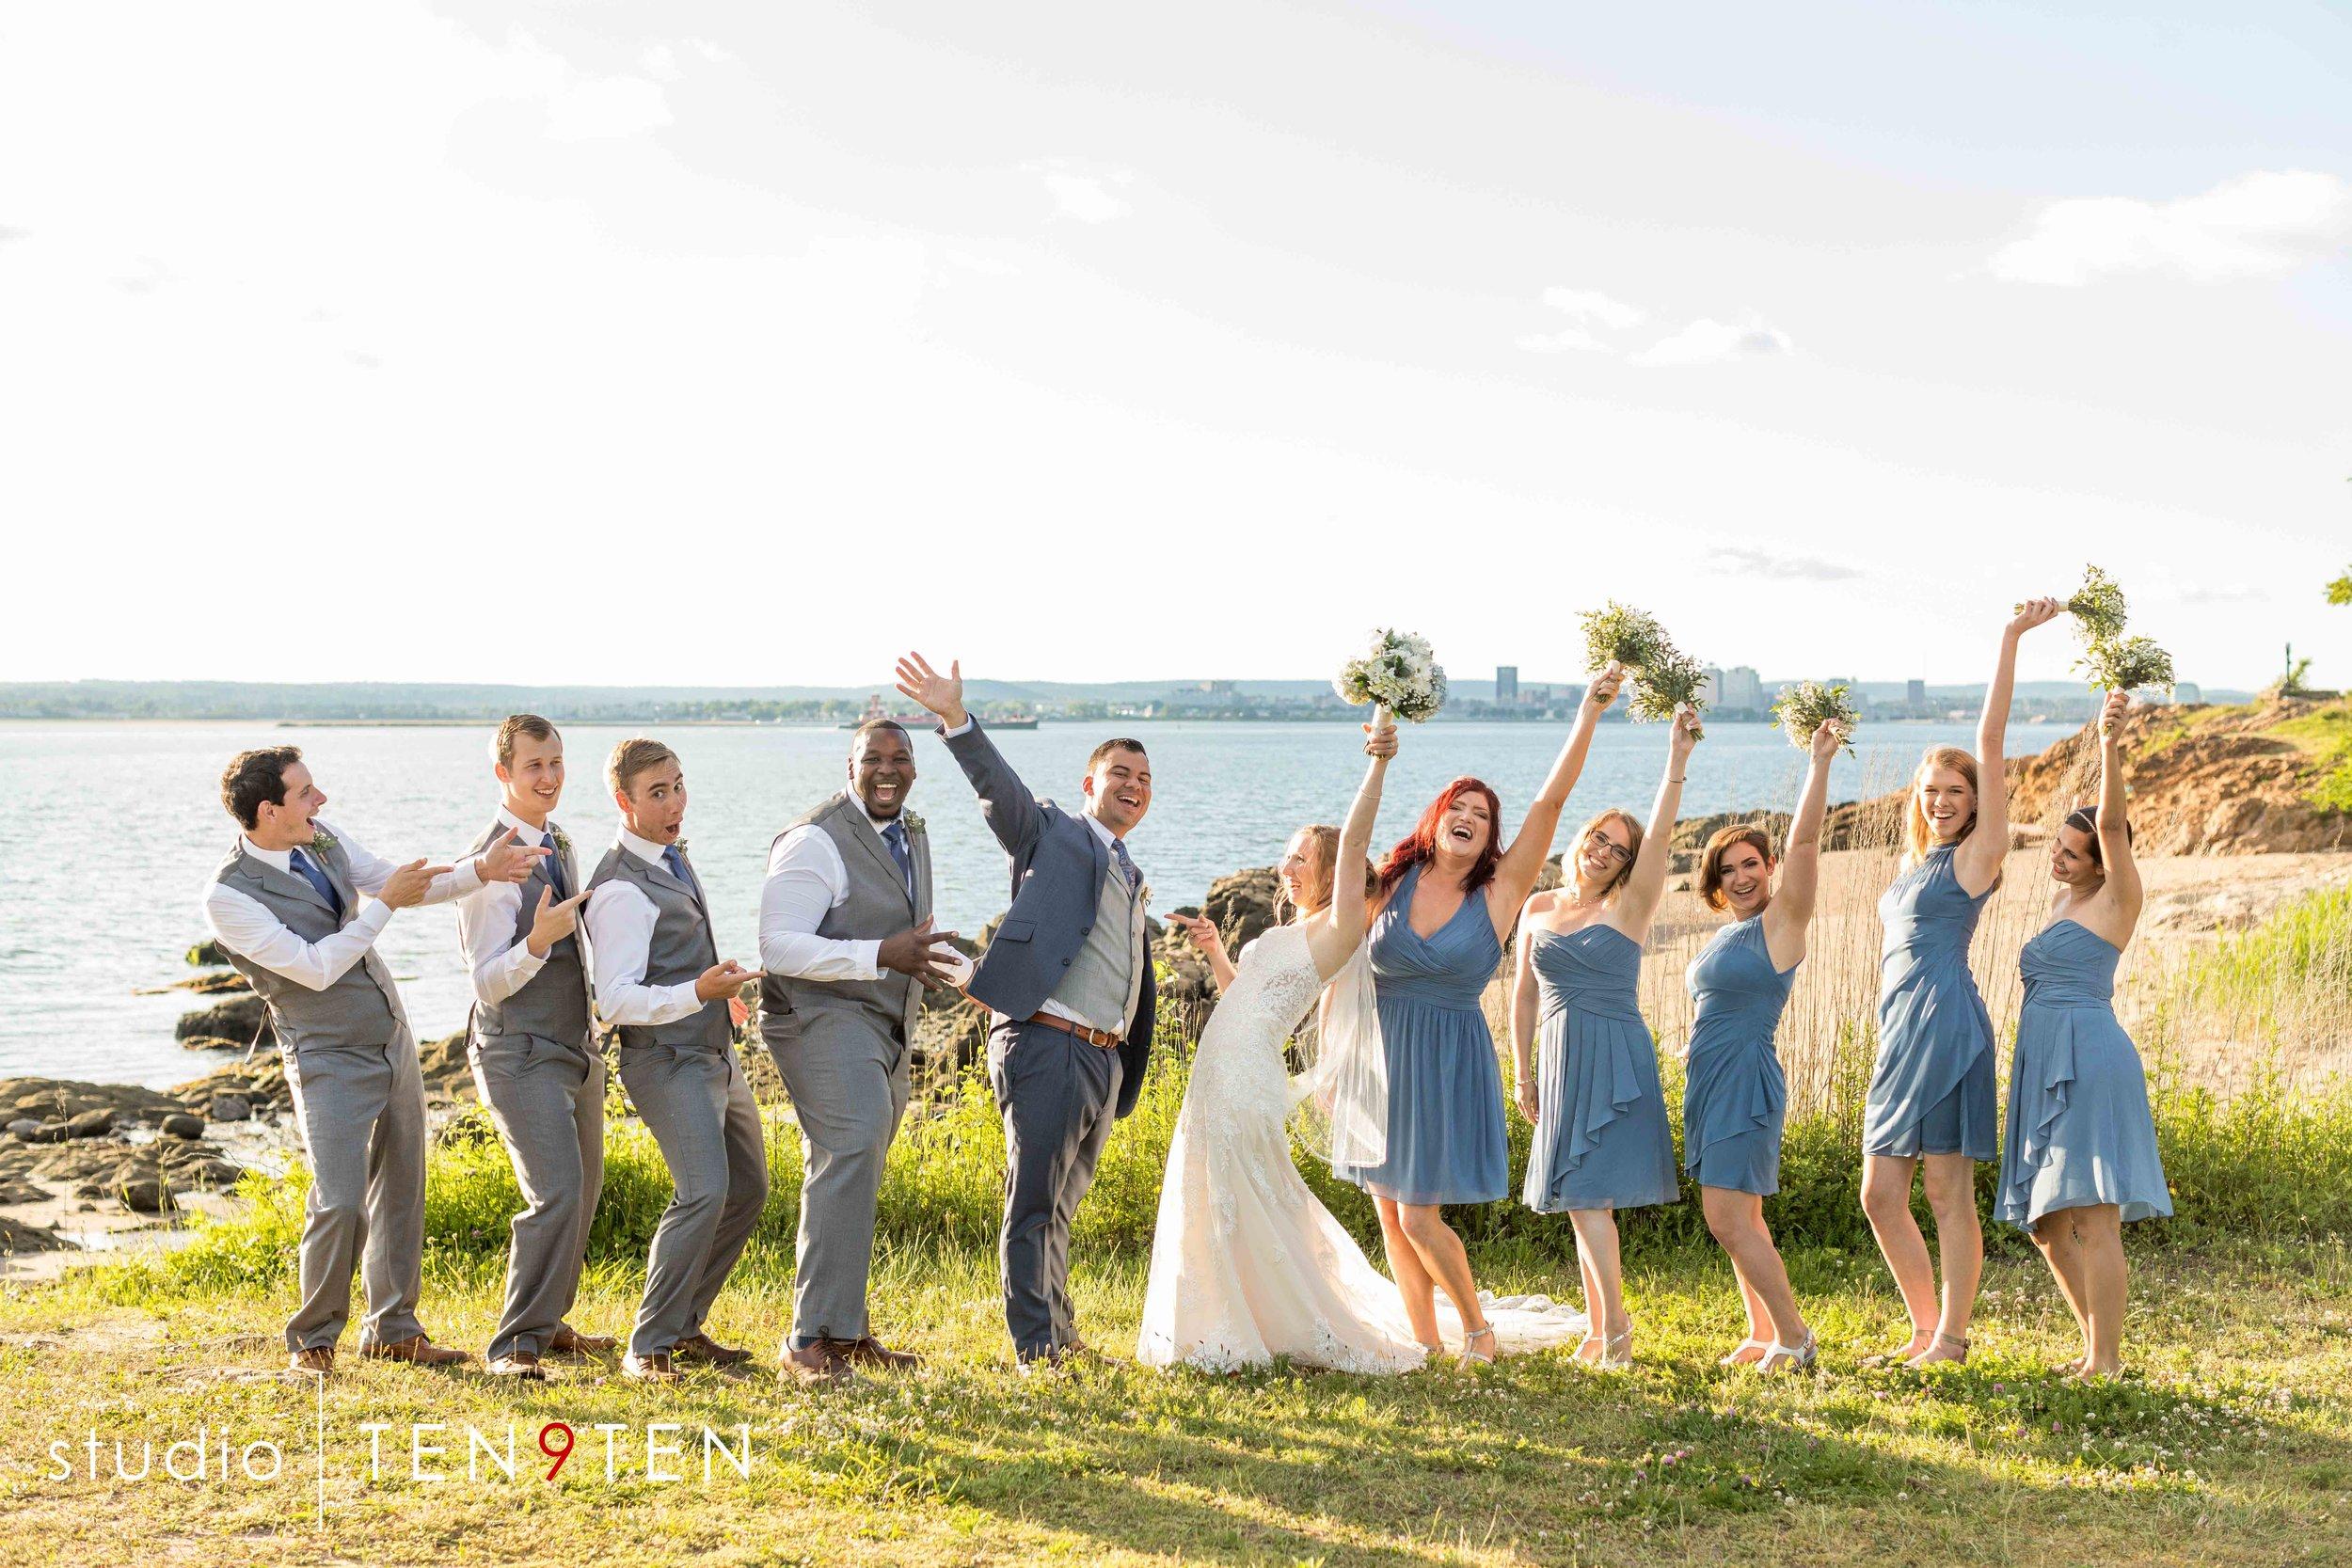 CT Beach Wedding Photographer